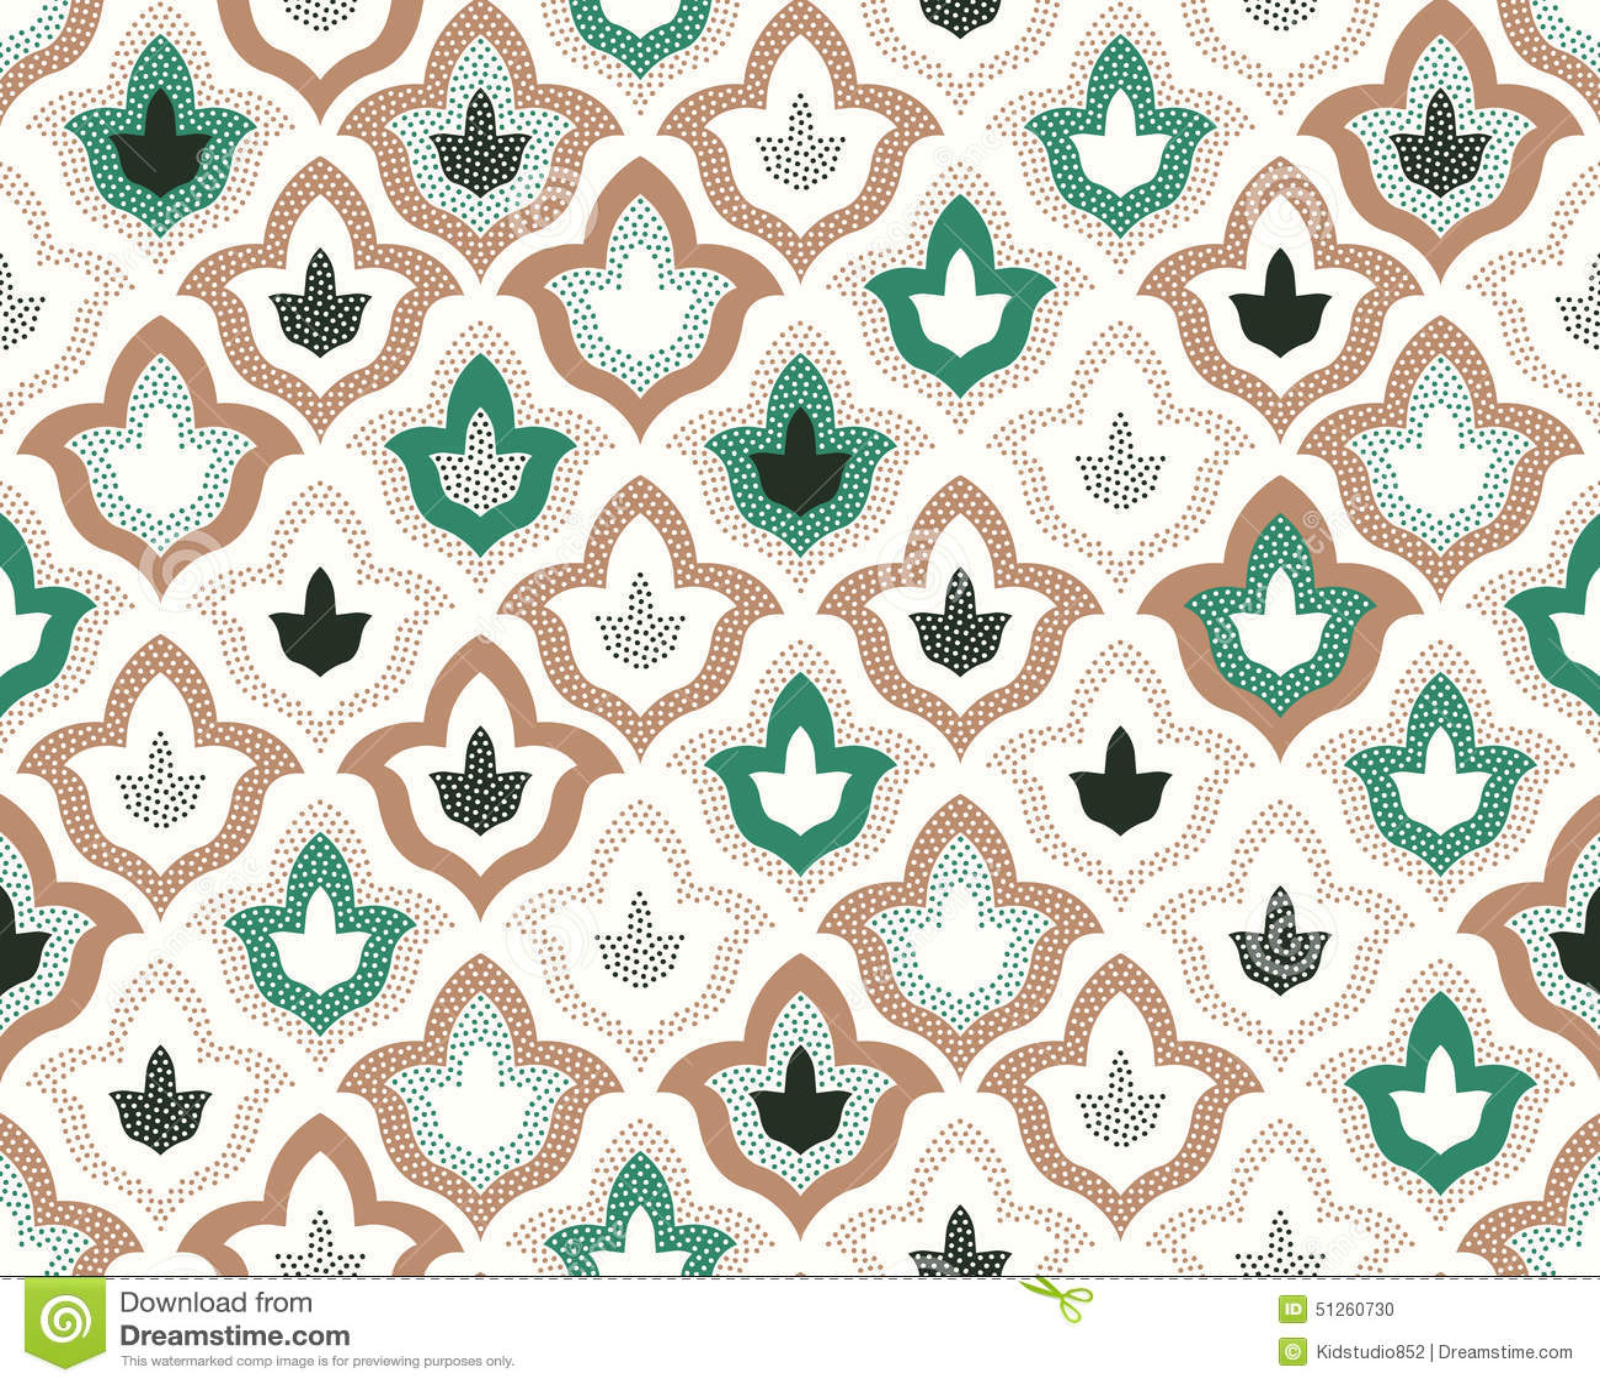 Geometrix Design Seamless Dots Islamic Pattern Stock Vector Image 51260730